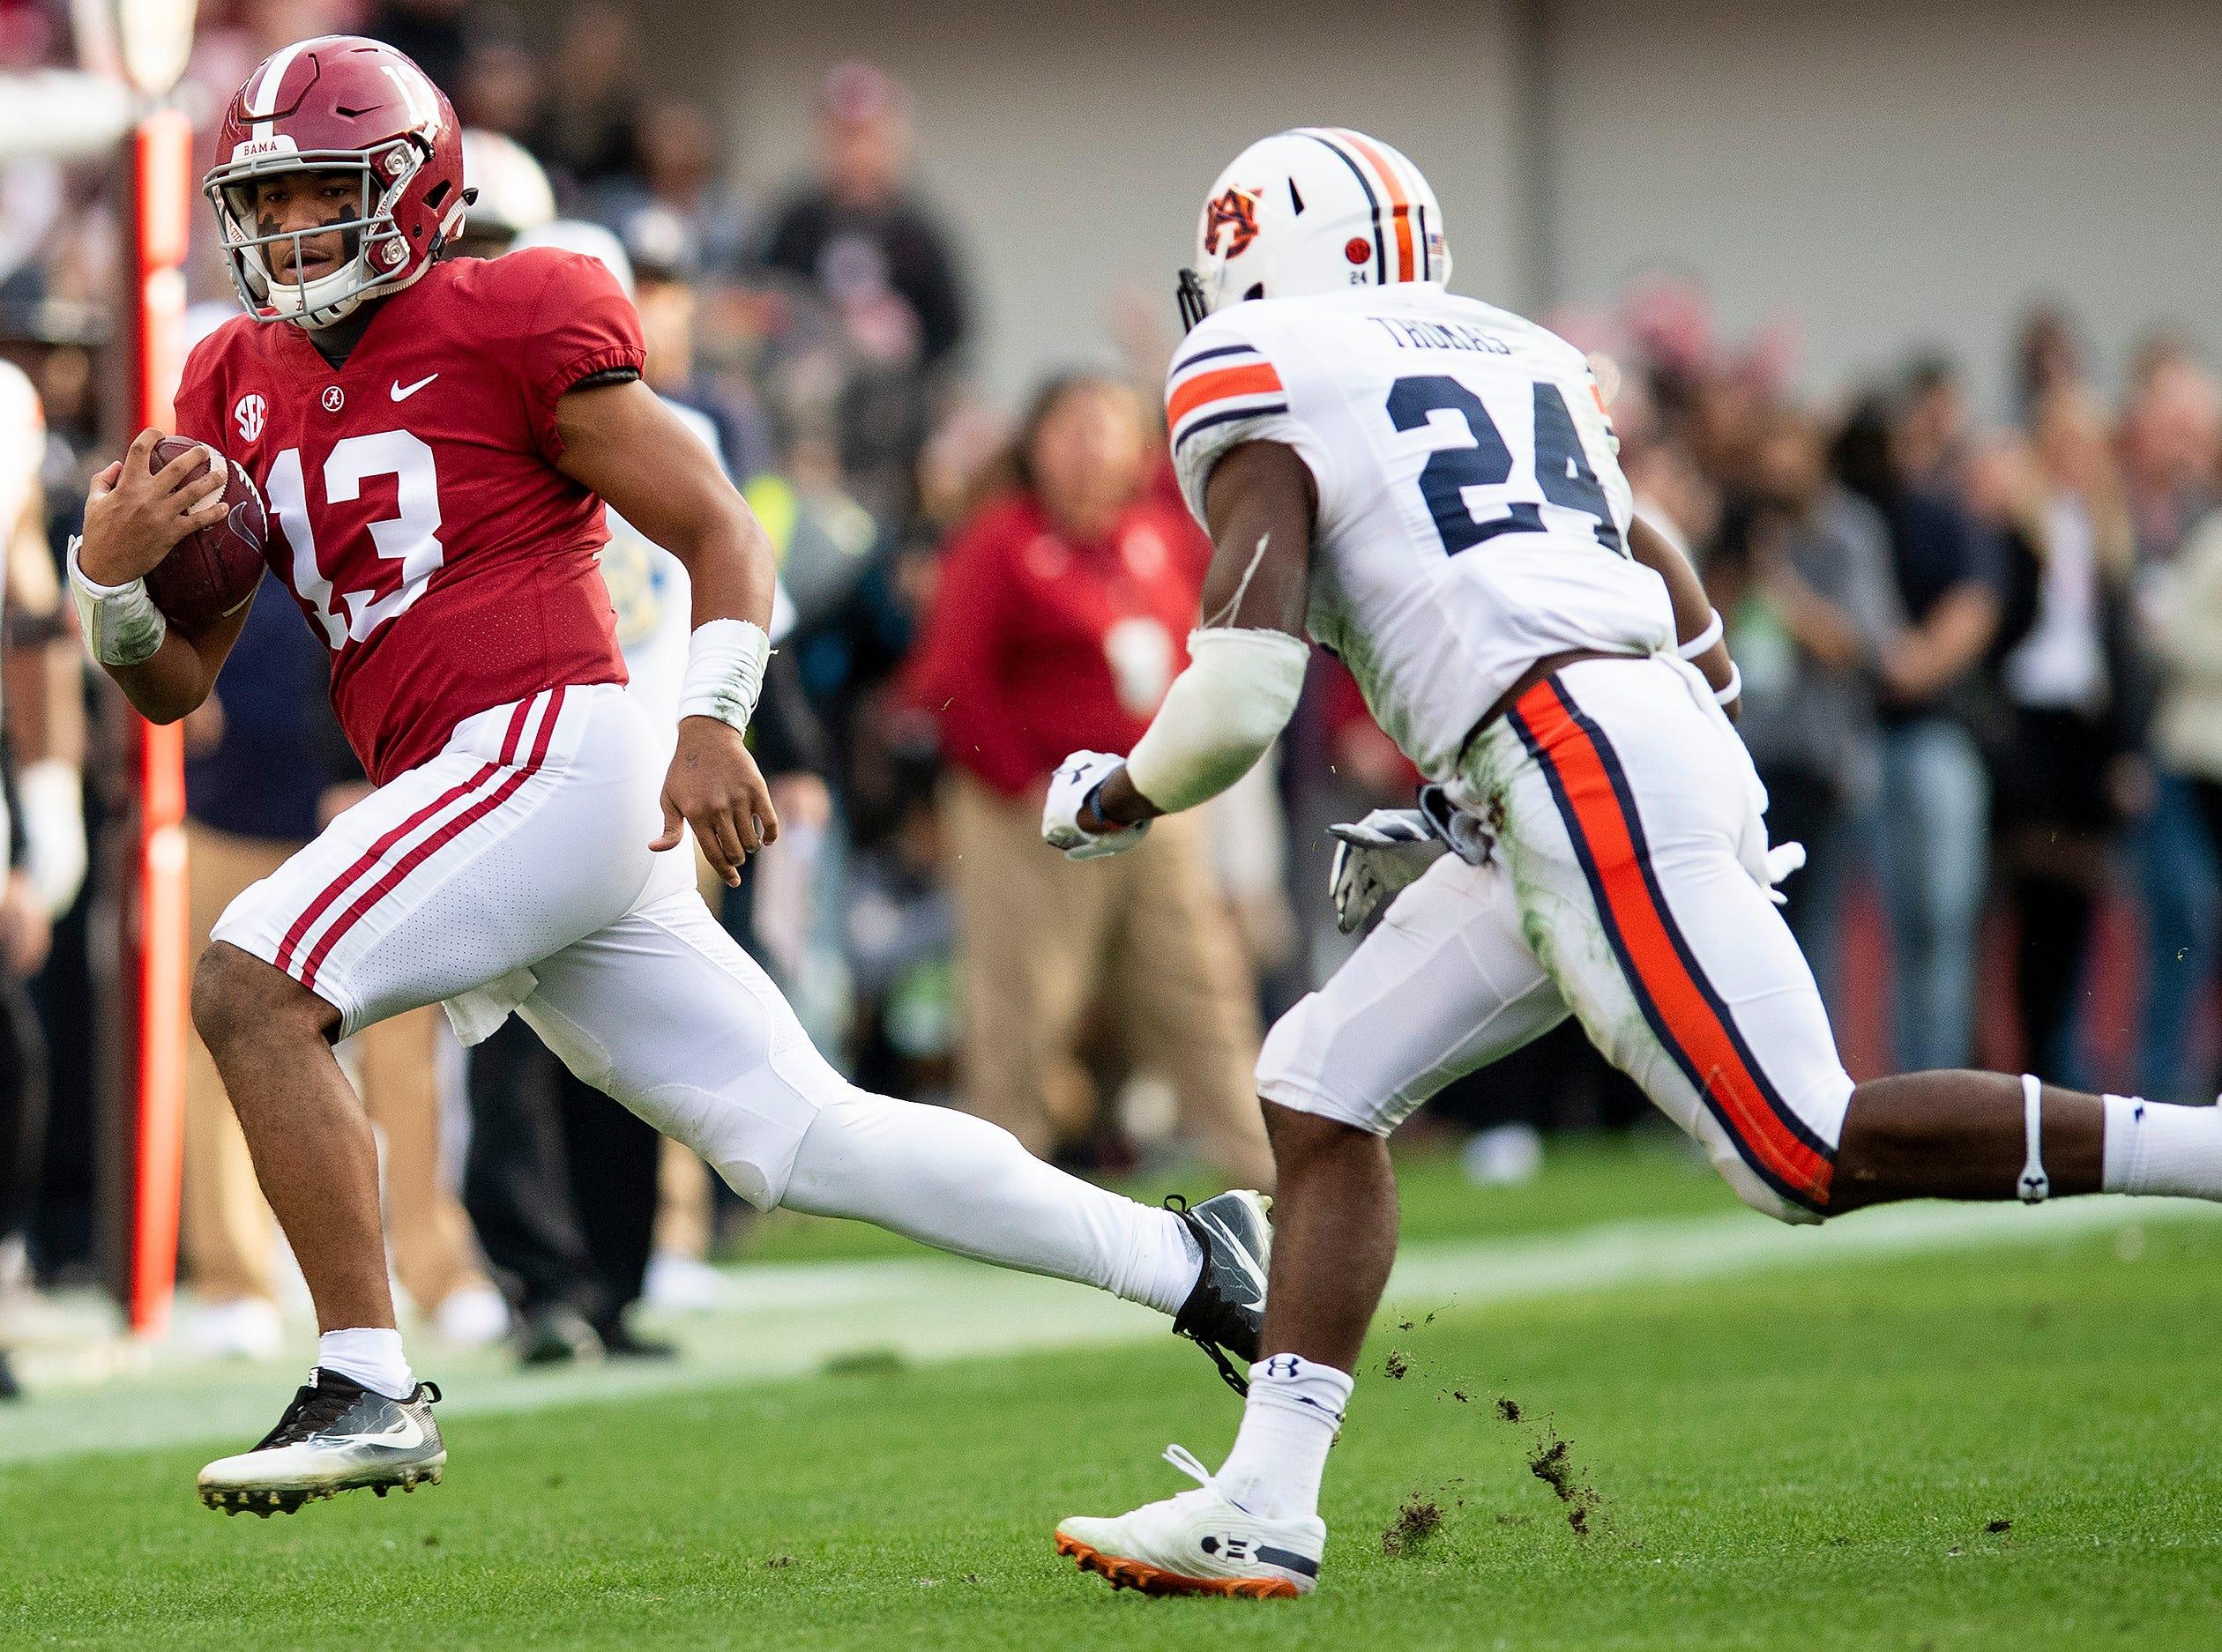 Alabama quarterback Tua Tagovailoa (13) eludes Auburn defensive back Daniel Thomas (24) in first half action during the Iron Bowl at Bryant-Denny Stadium in Tuscaloosa, Ala., on Saturday November 24, 2018.